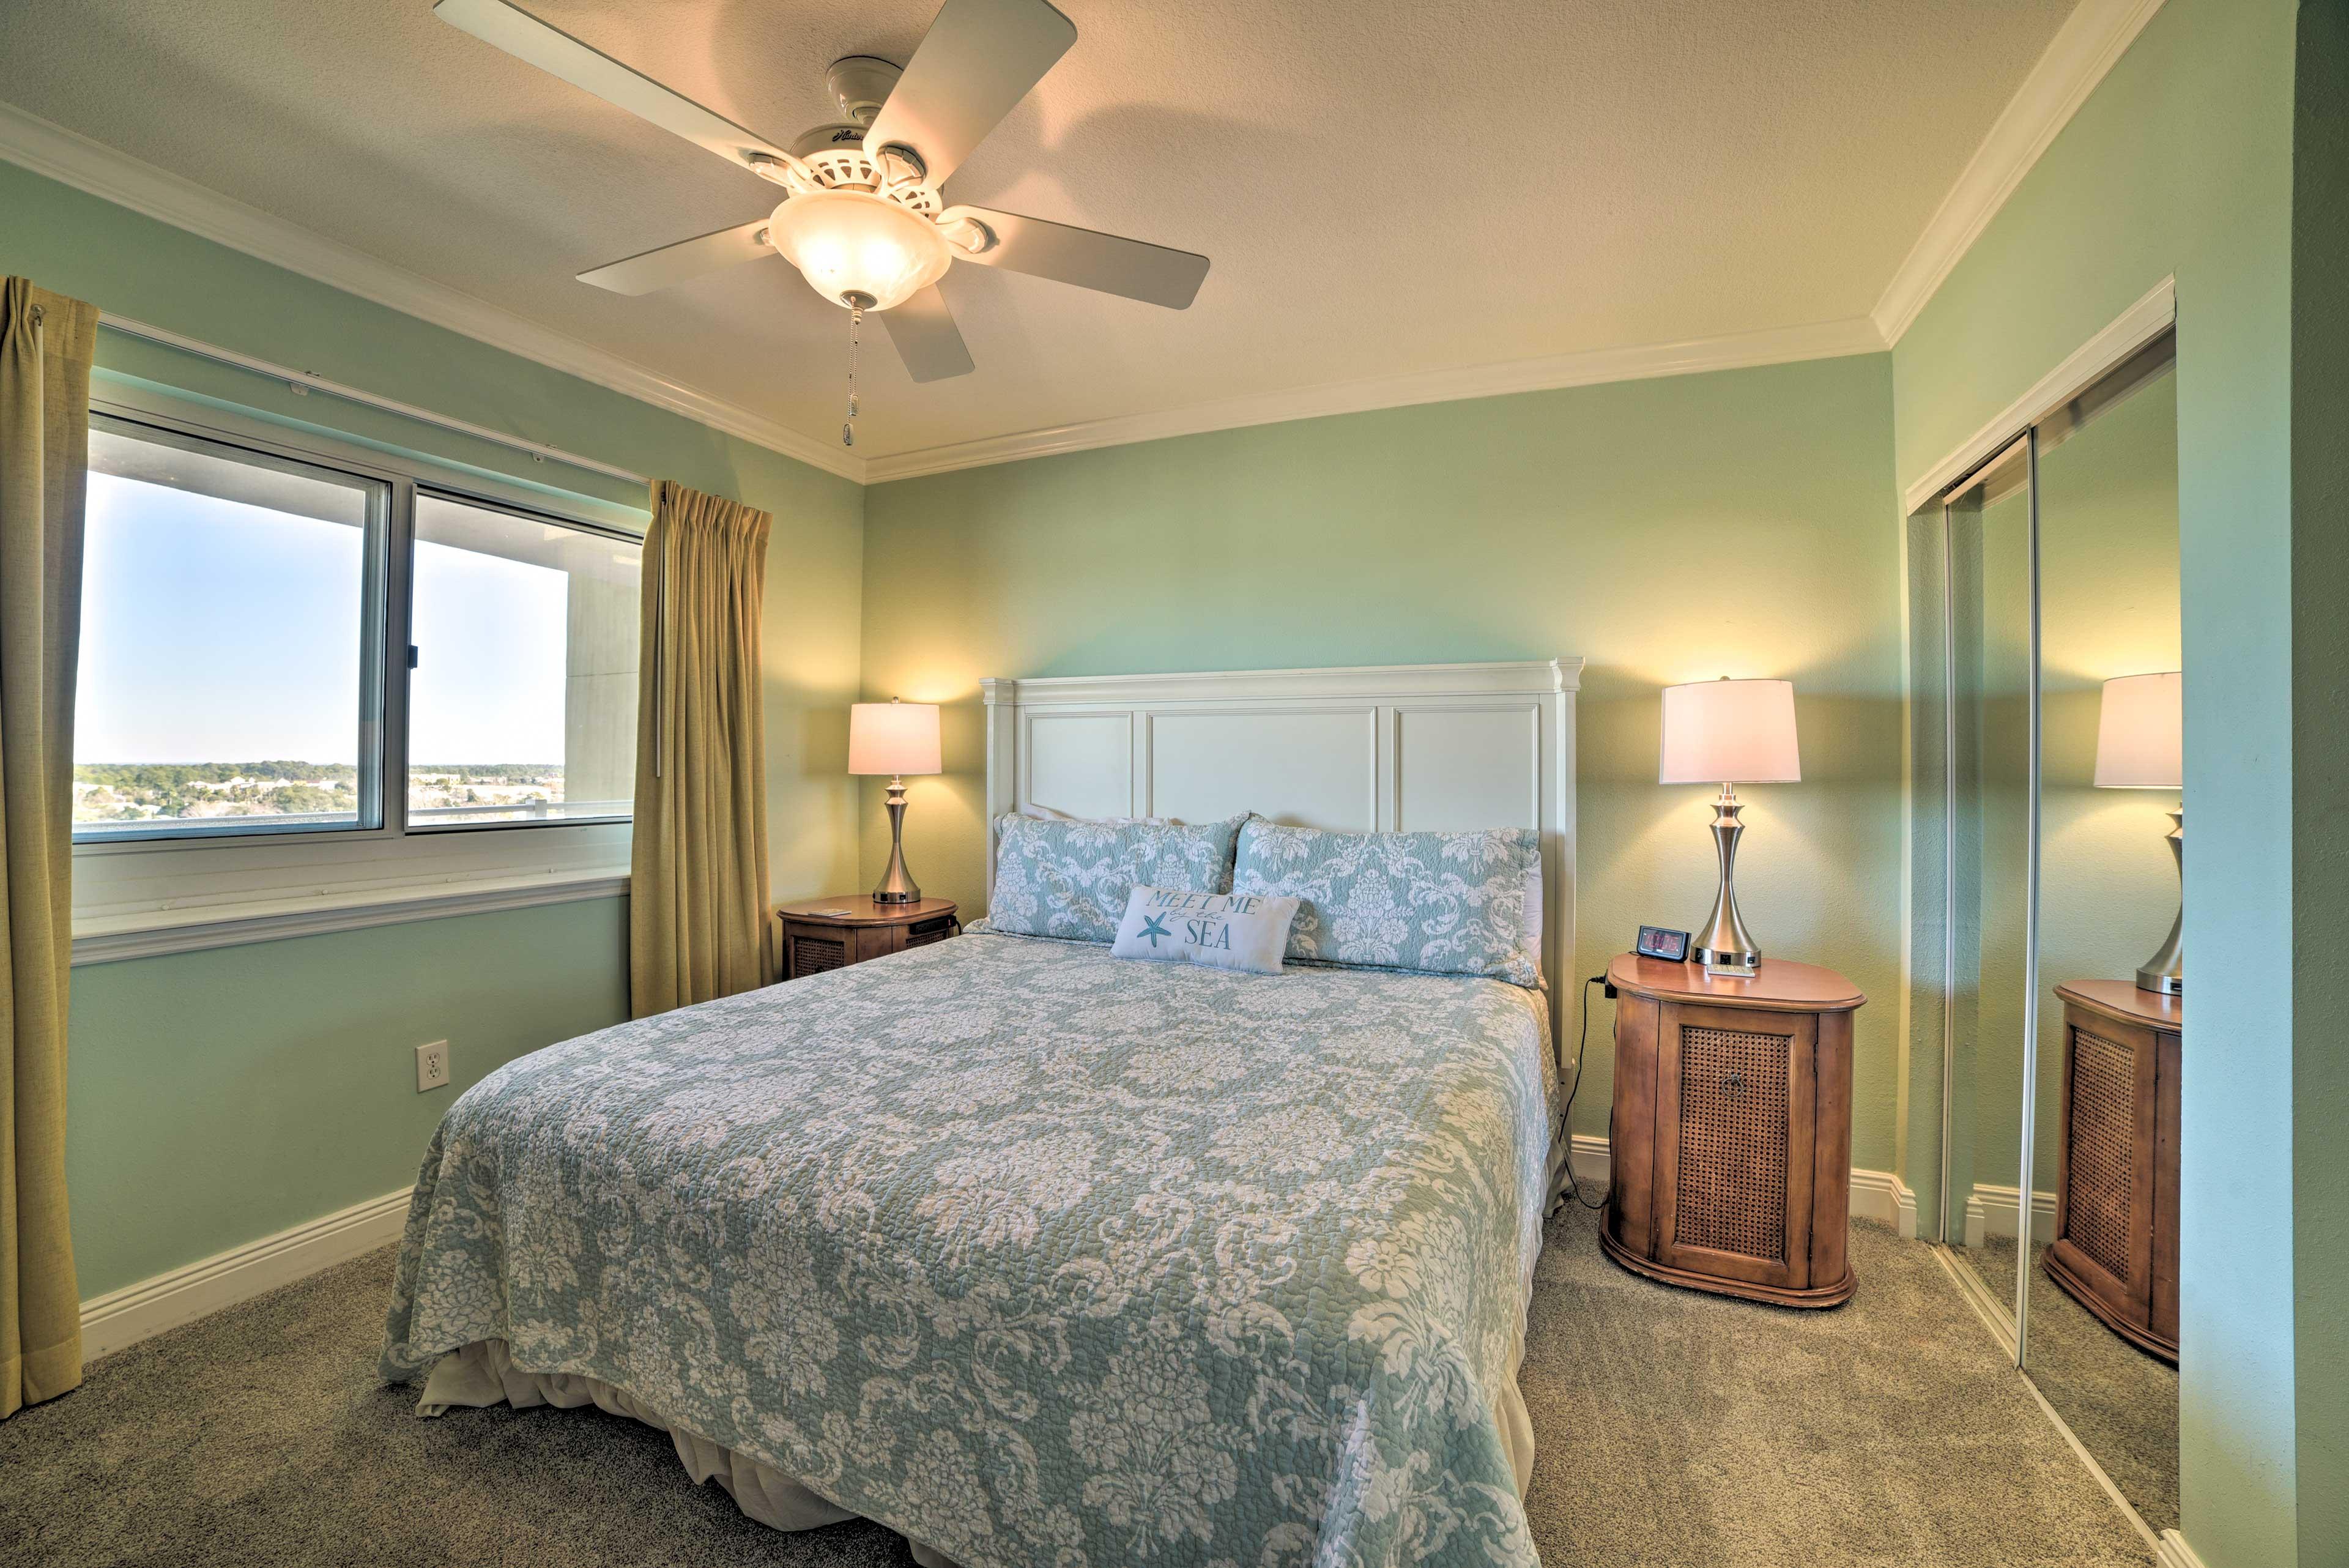 Bedroom | Linens Provided